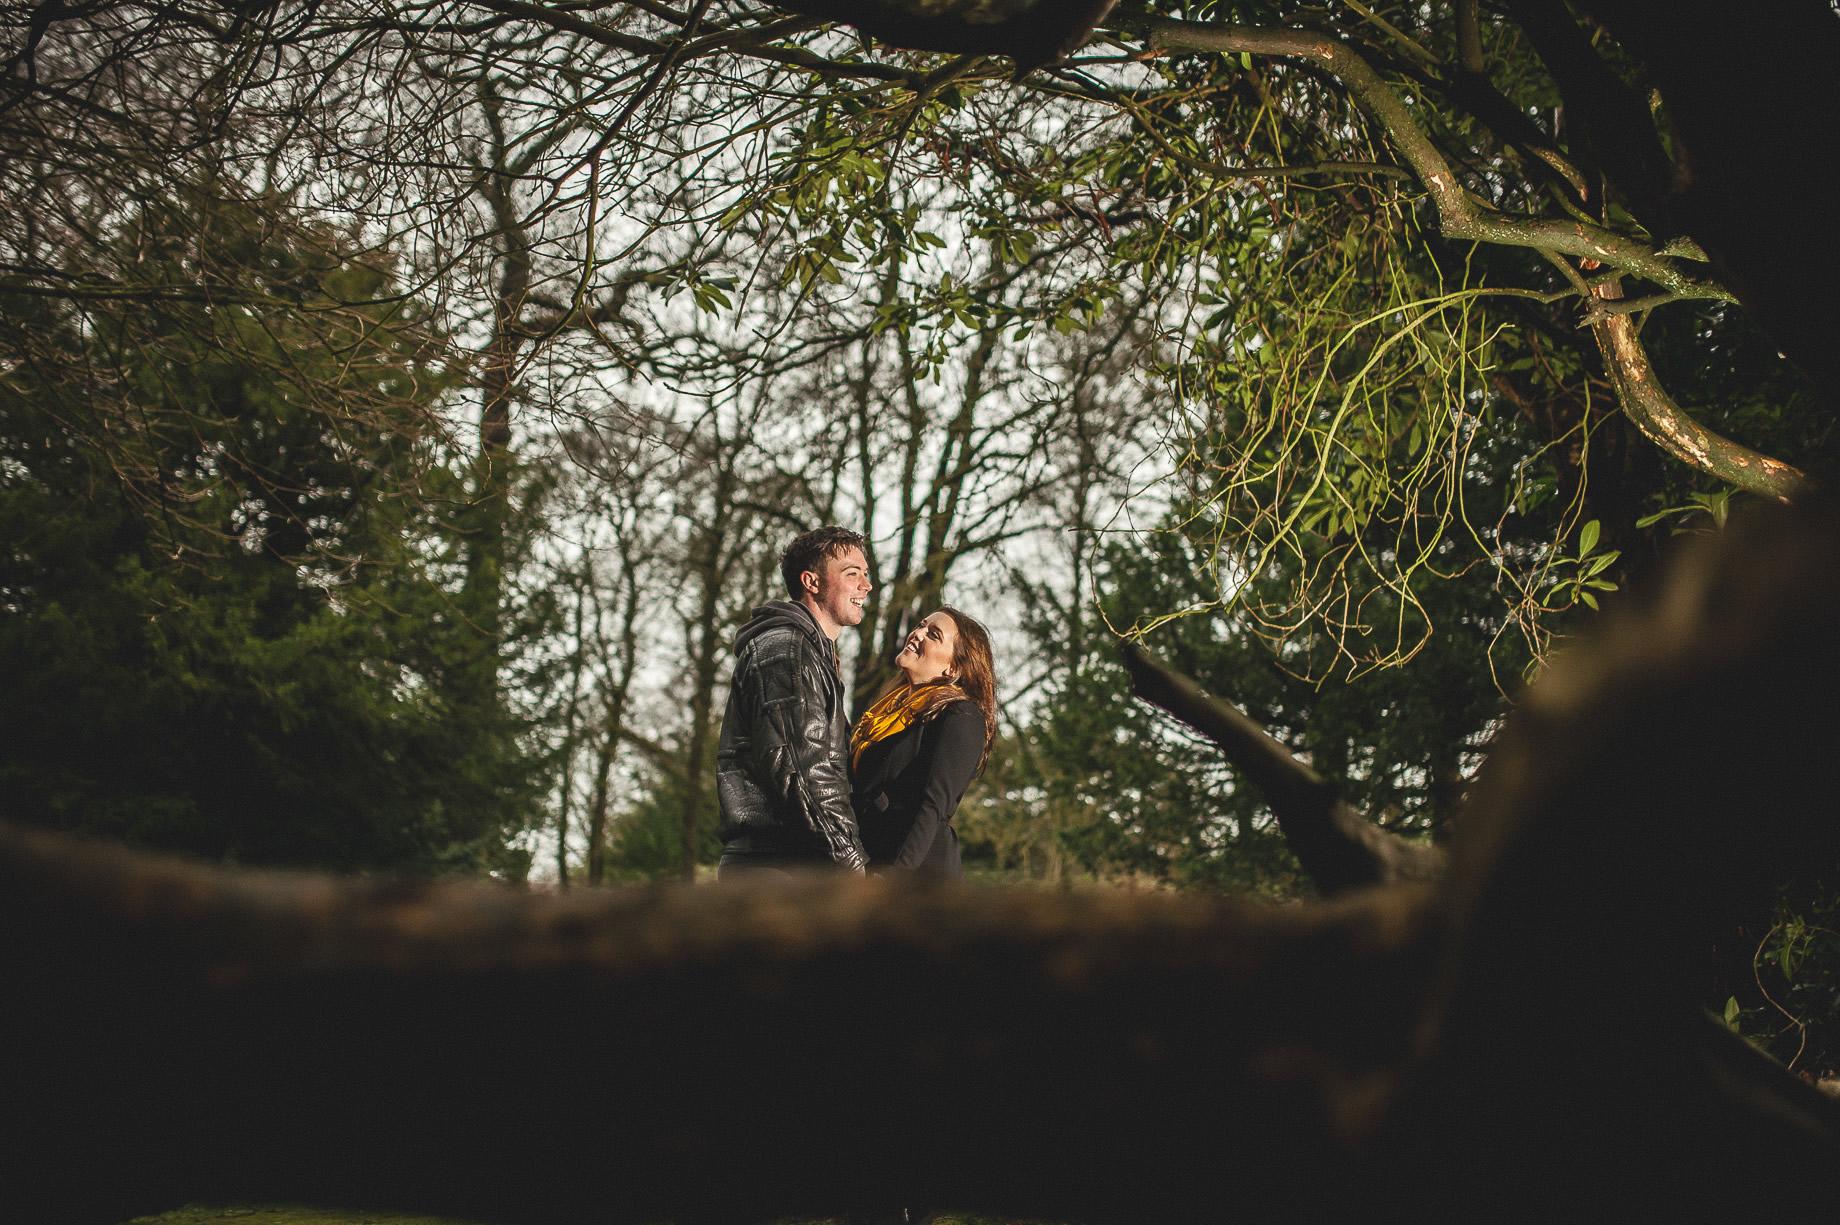 Rachael and Gareth Portrait Shoot at Gawthorpe Hall 021